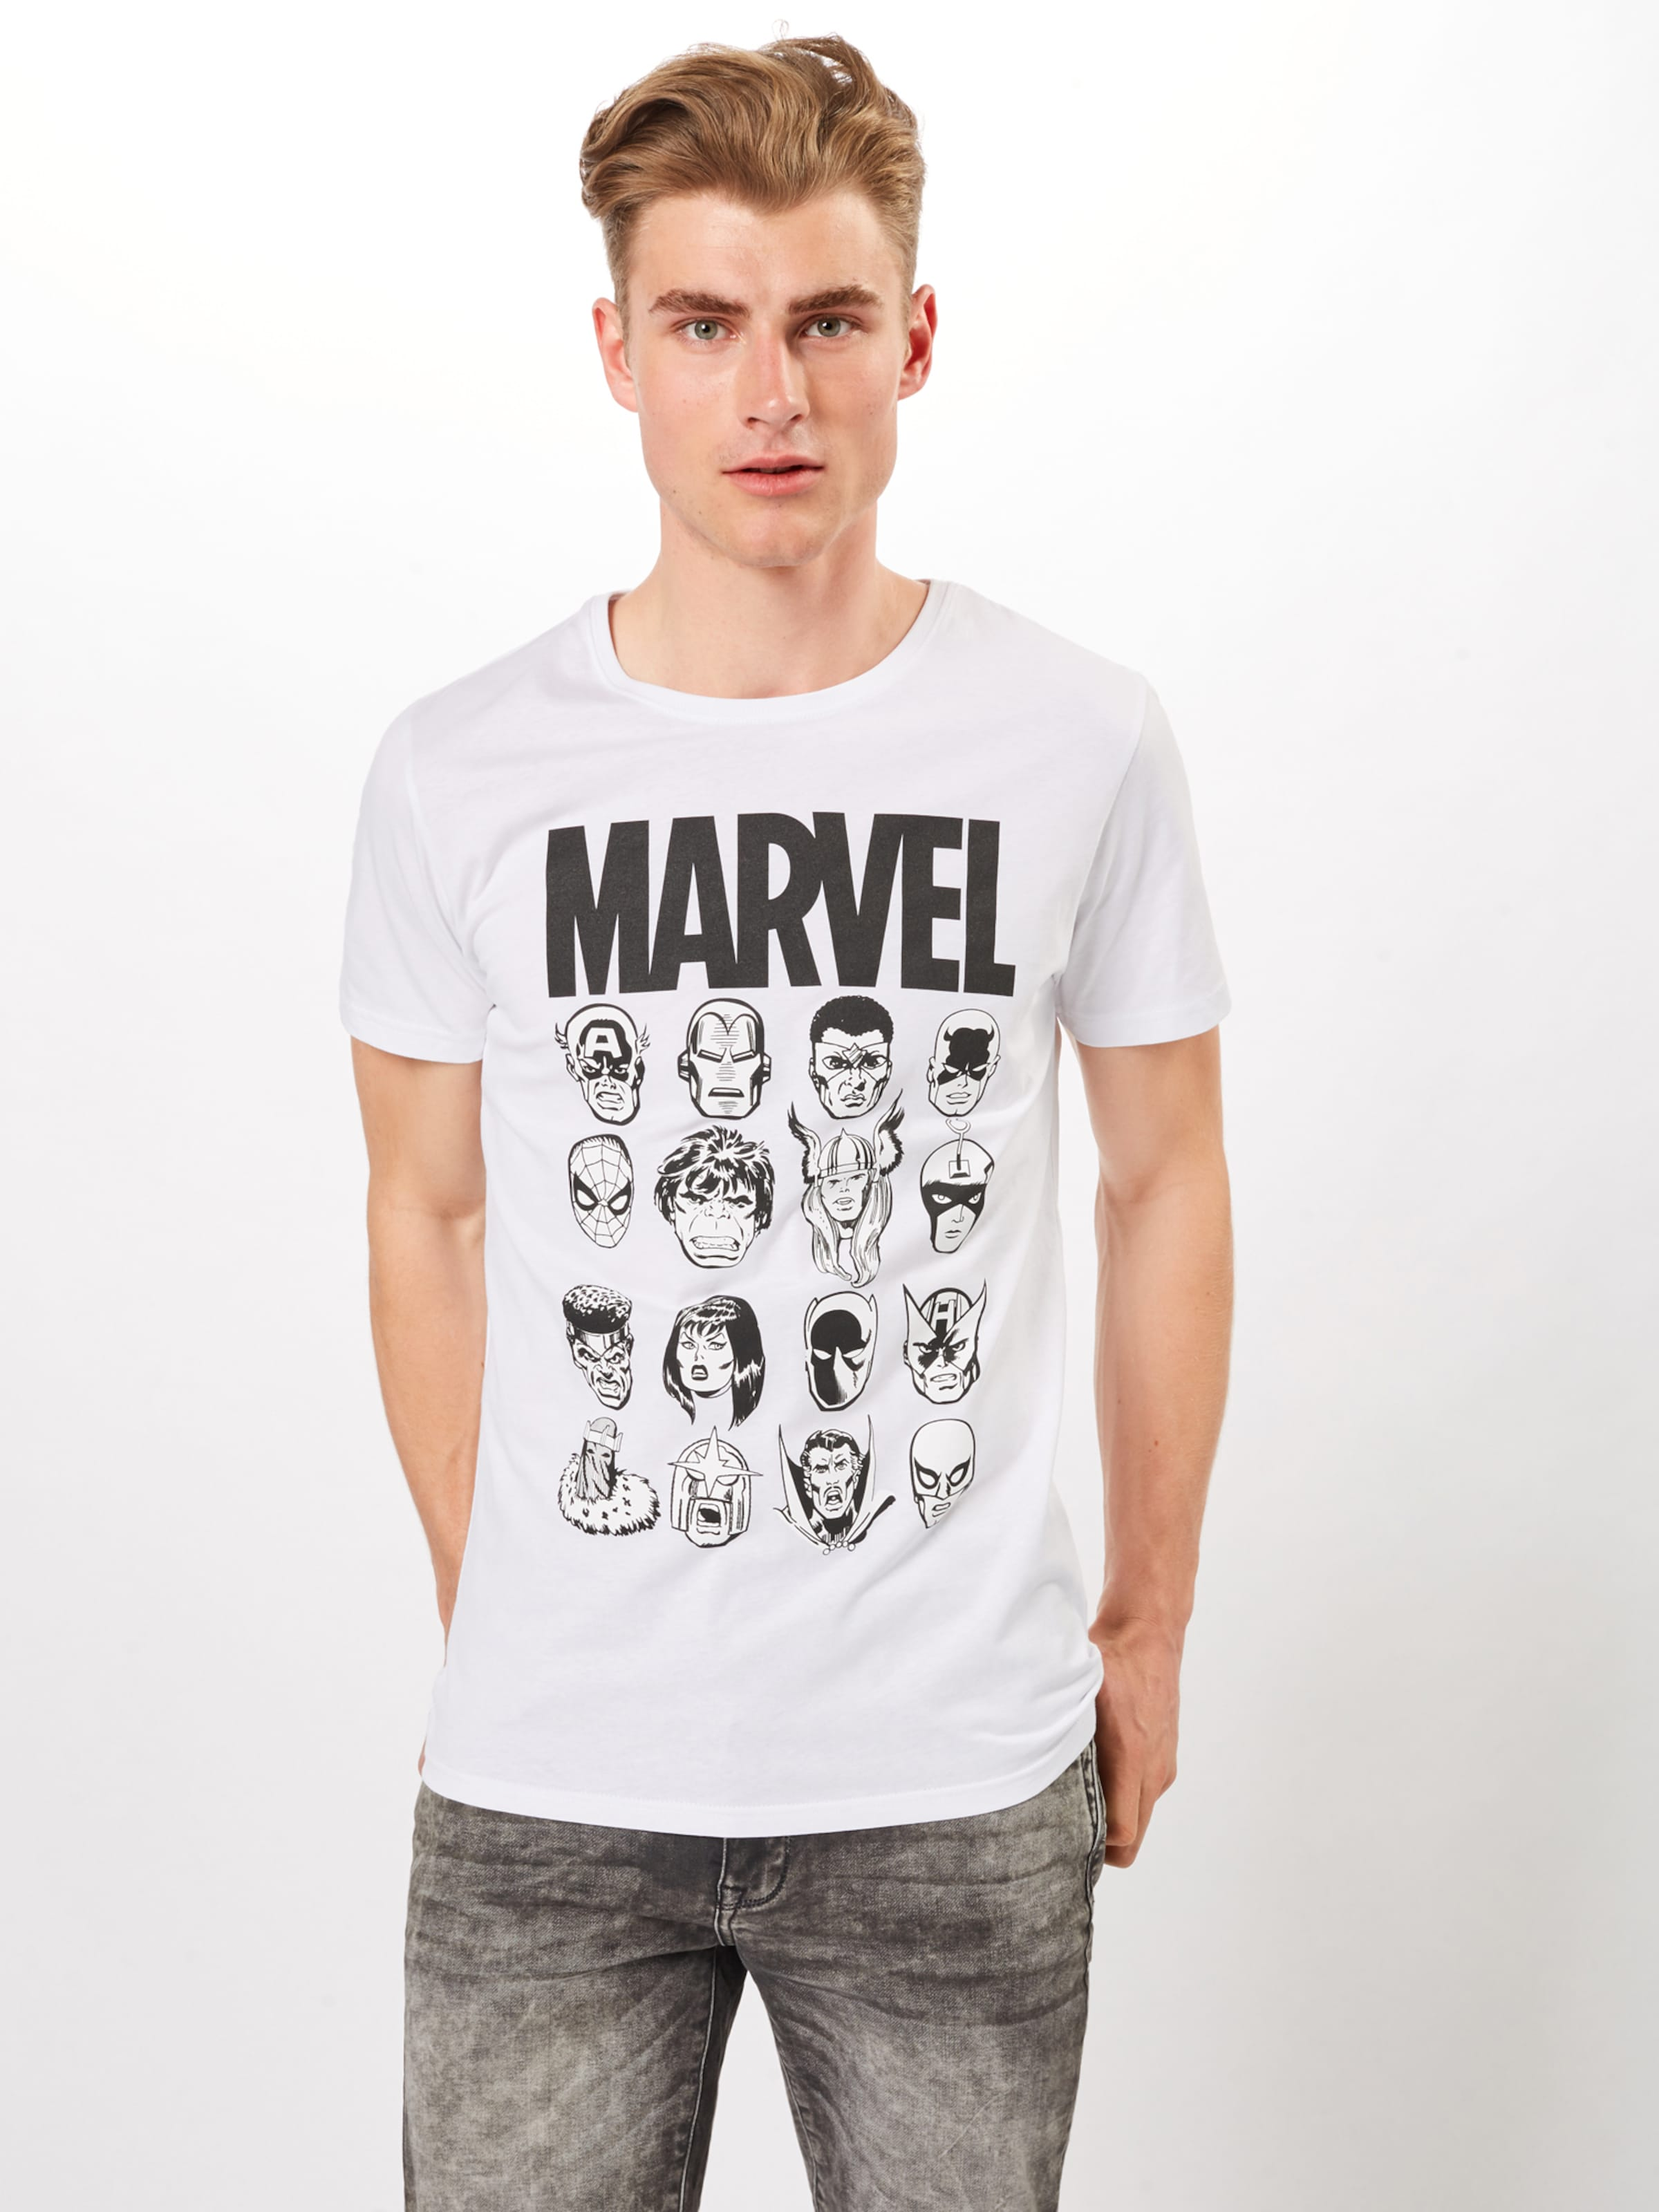 Mister Blanc shirt Tee T 'marvel' En H9DWE2eIYb